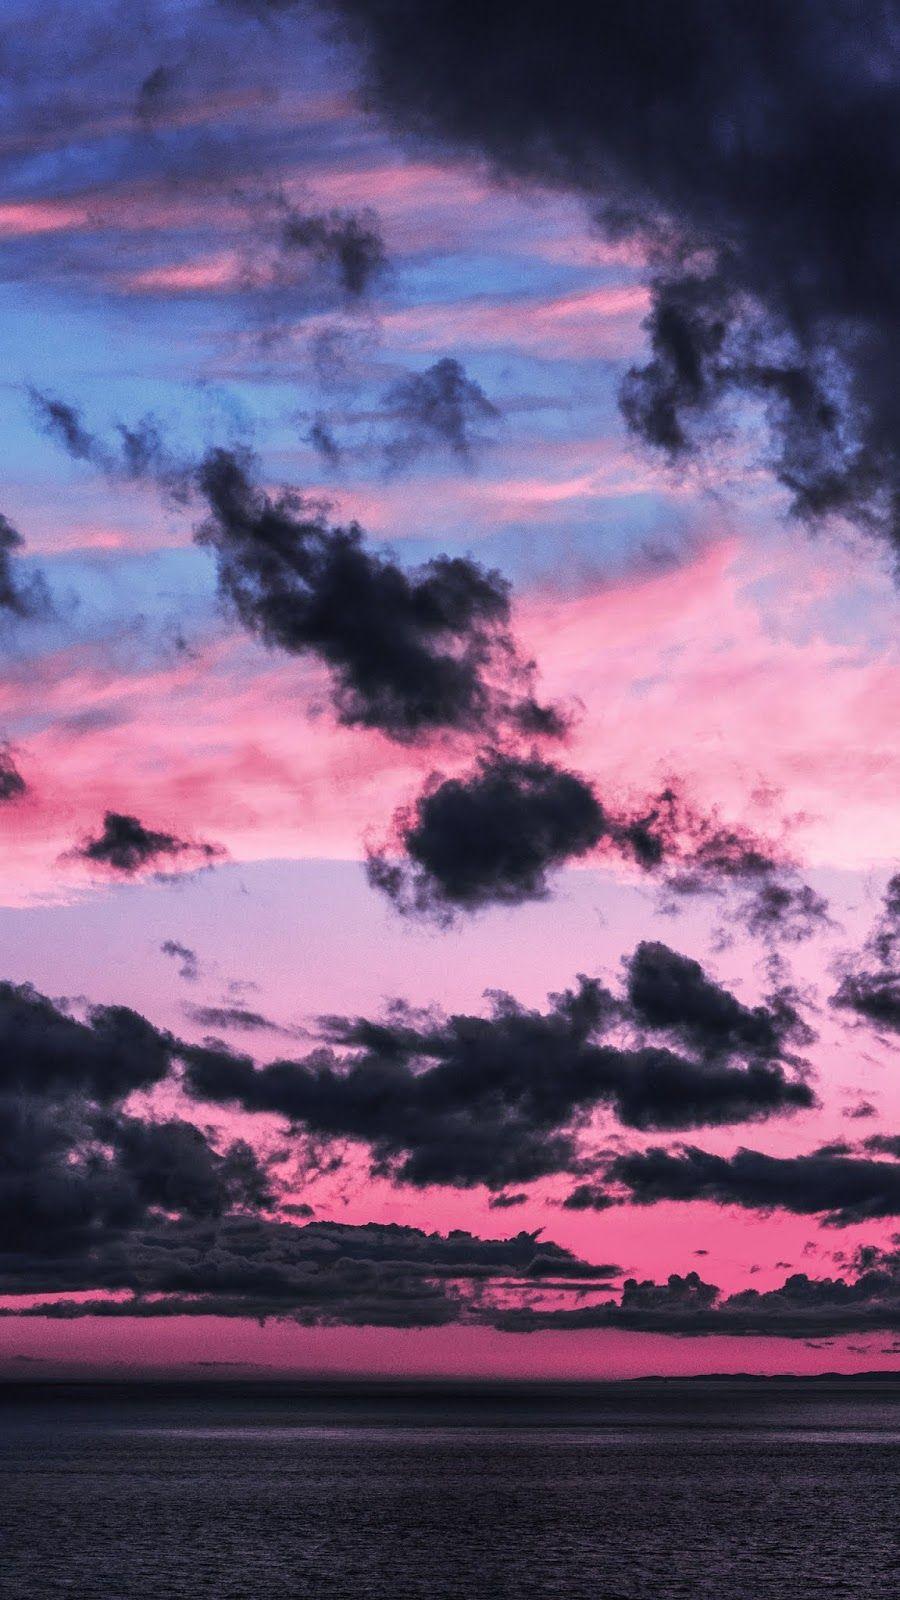 My Favorite Wallpaper Clouds Night Sky Wallpaper Dark Wallpaper Iphone Iphone Wallpaper Sky